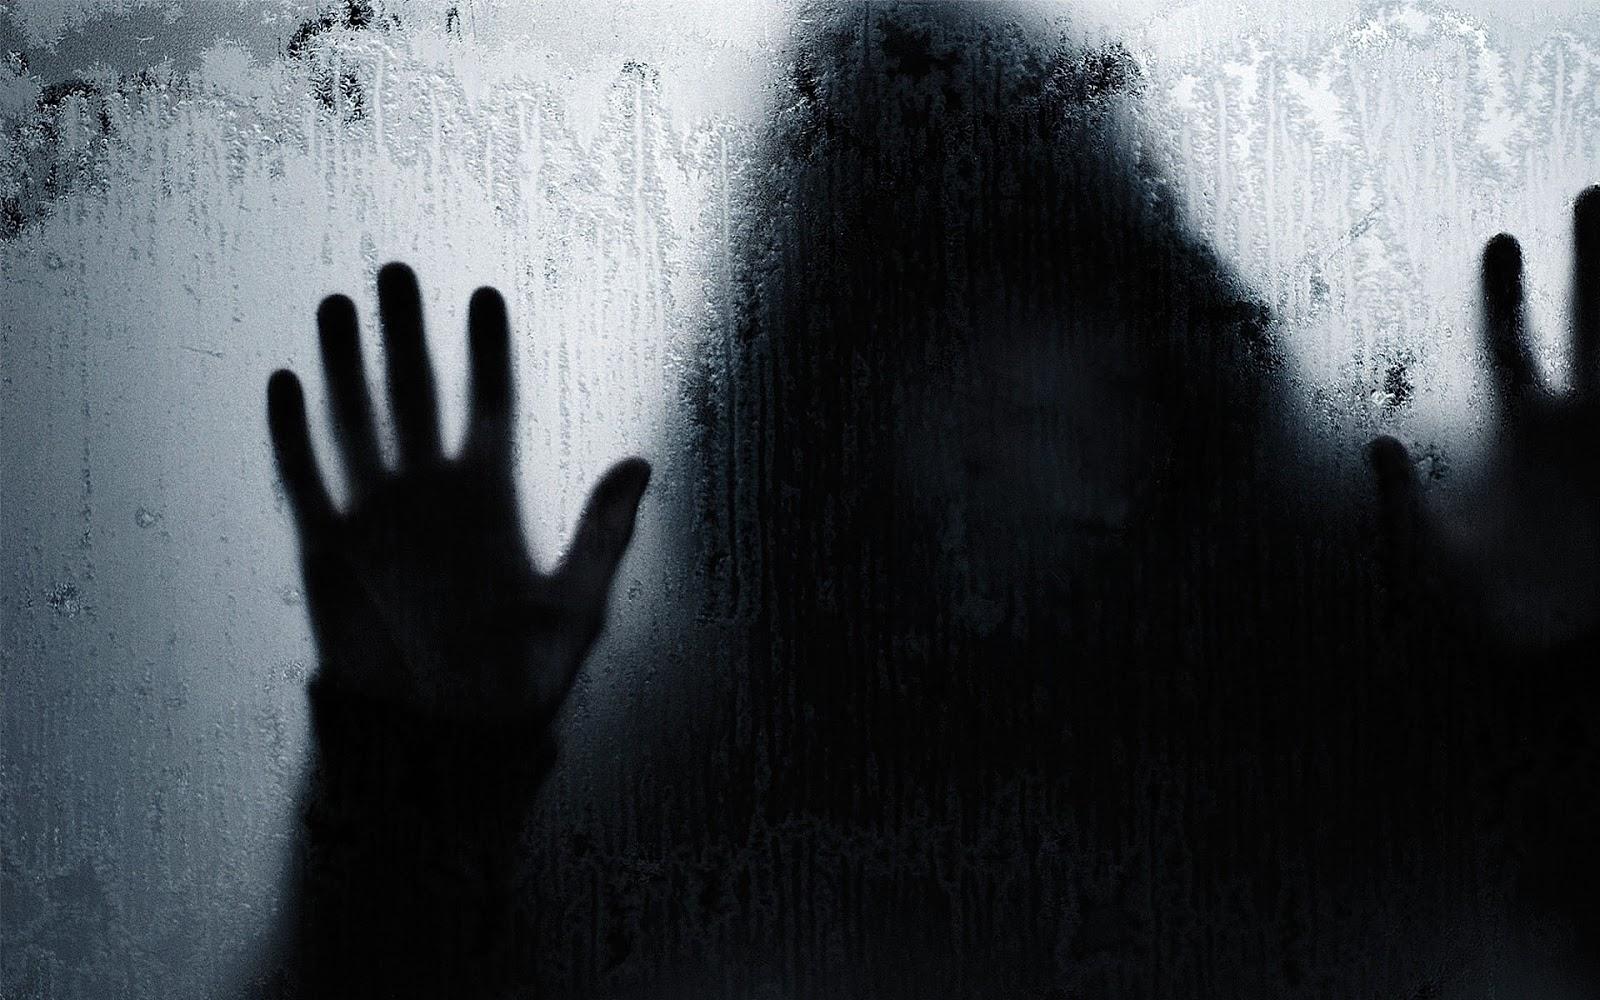 Creepy Hd Wallpaper: Scary HD Wallpapers